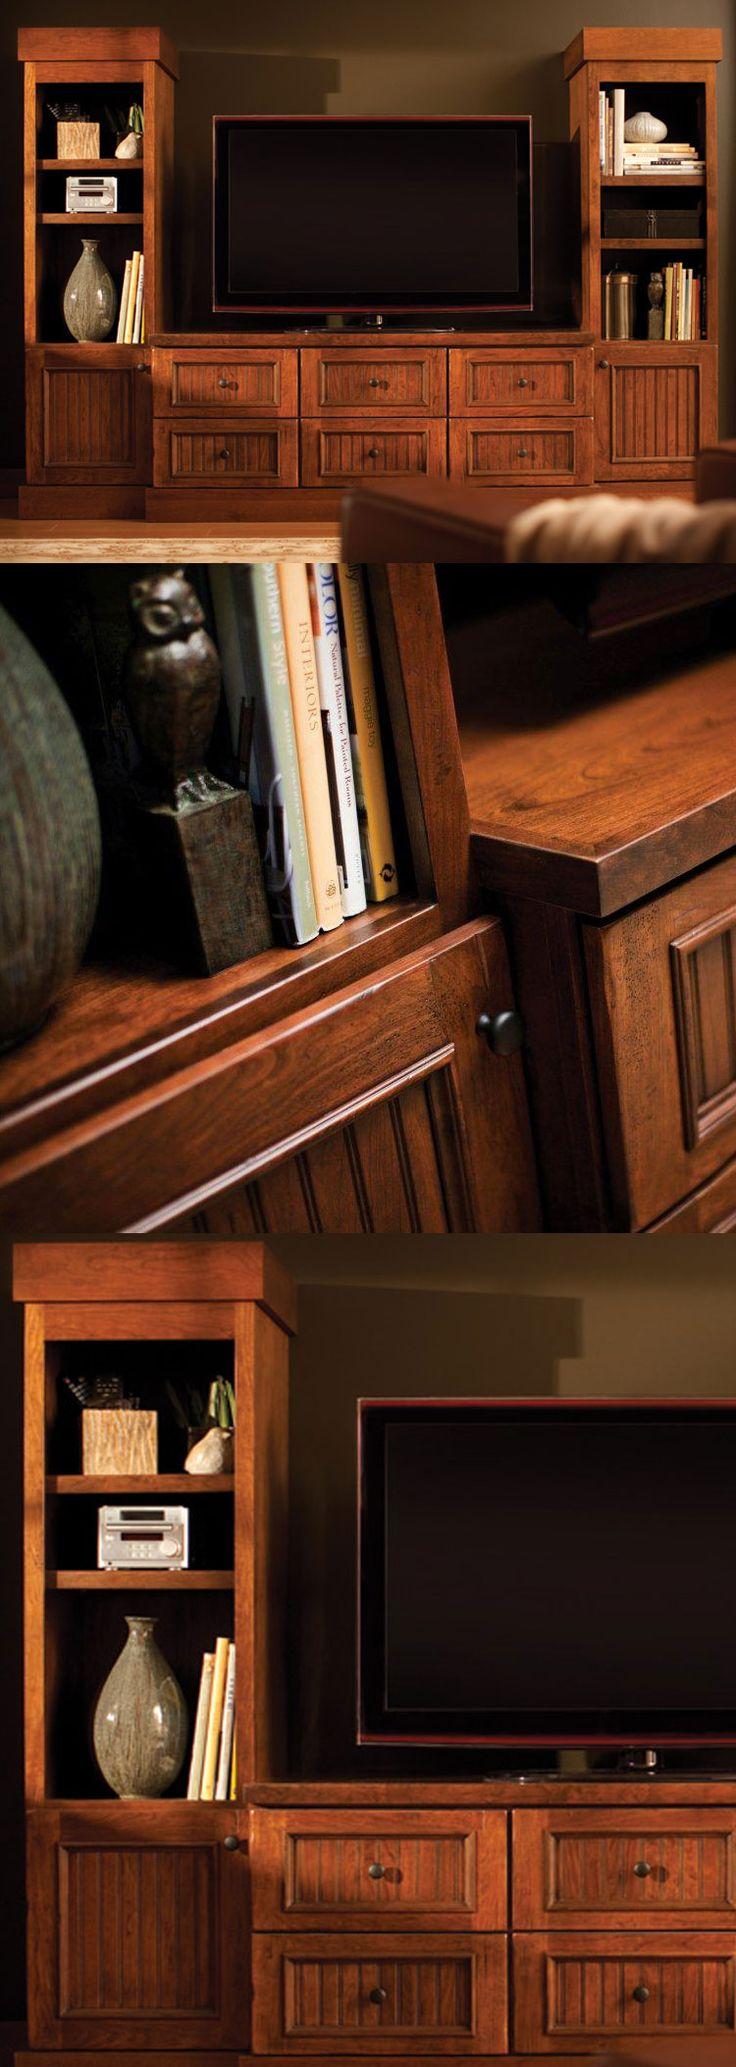 86 best living room living images on pinterest | entertainment